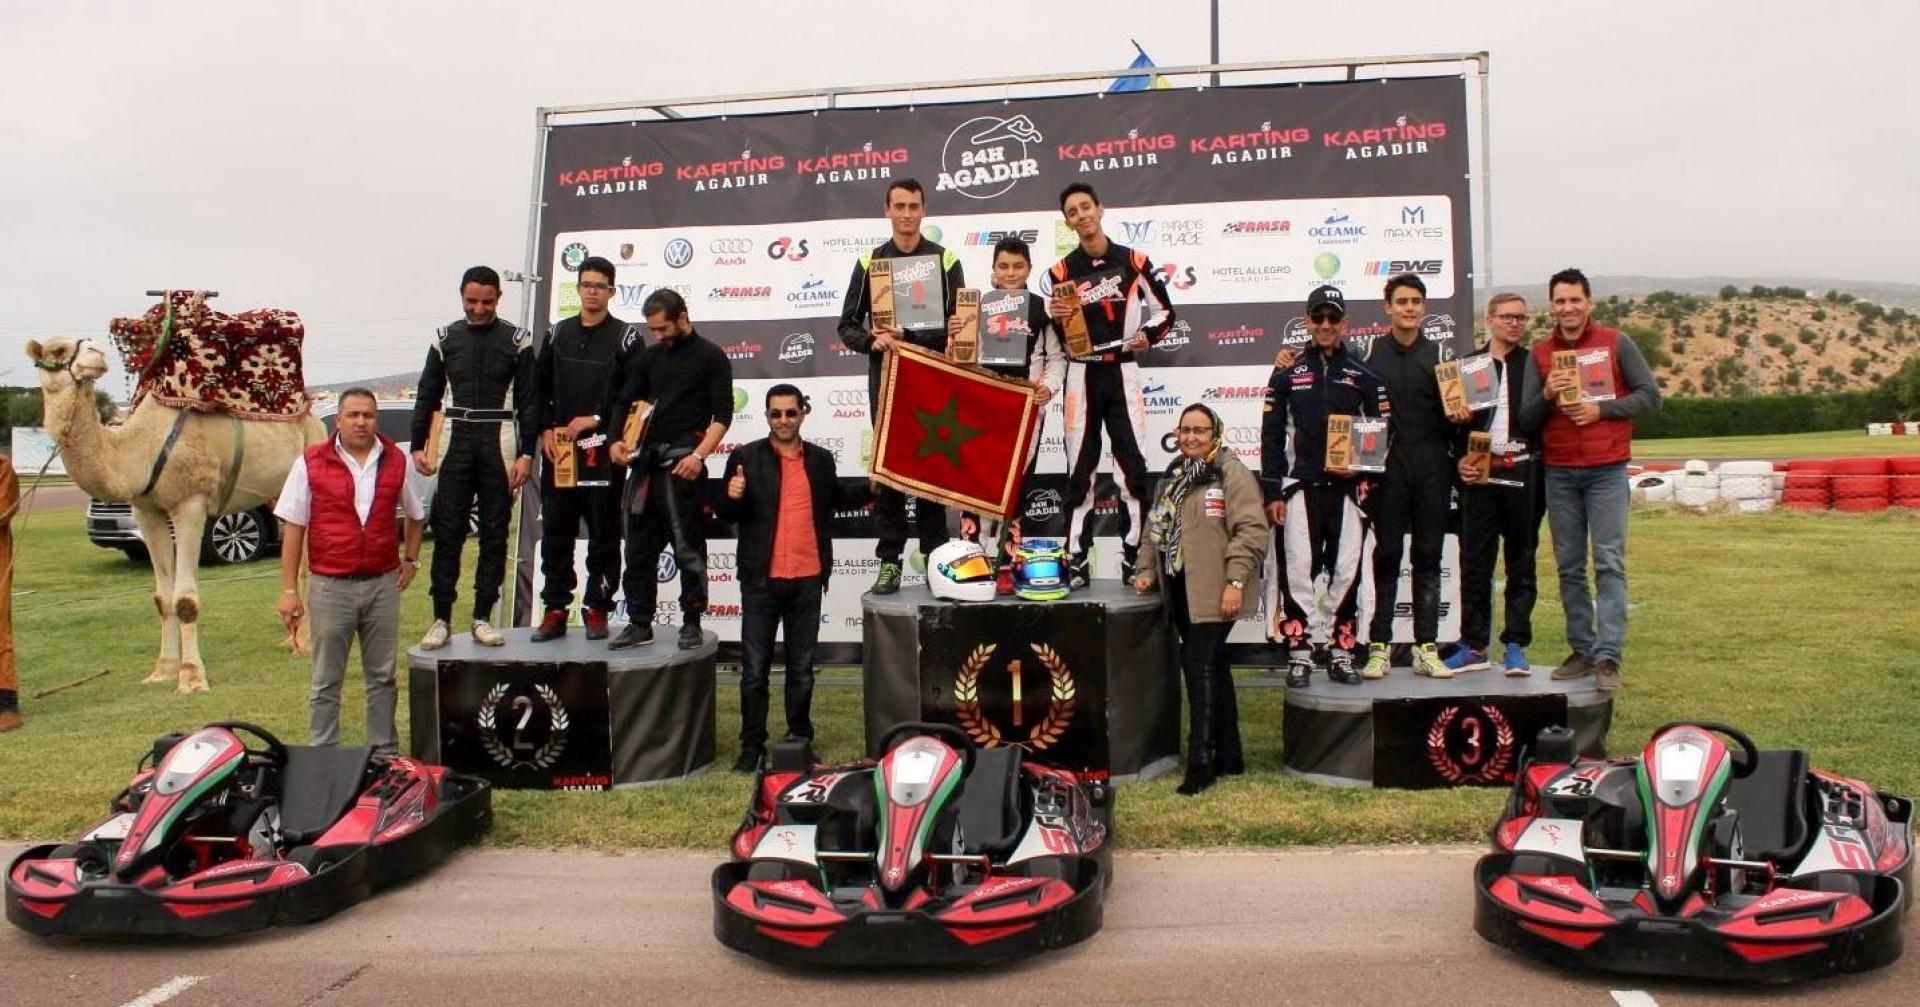 L'expérience des 24 heures d'endurance Karting d'Agadir